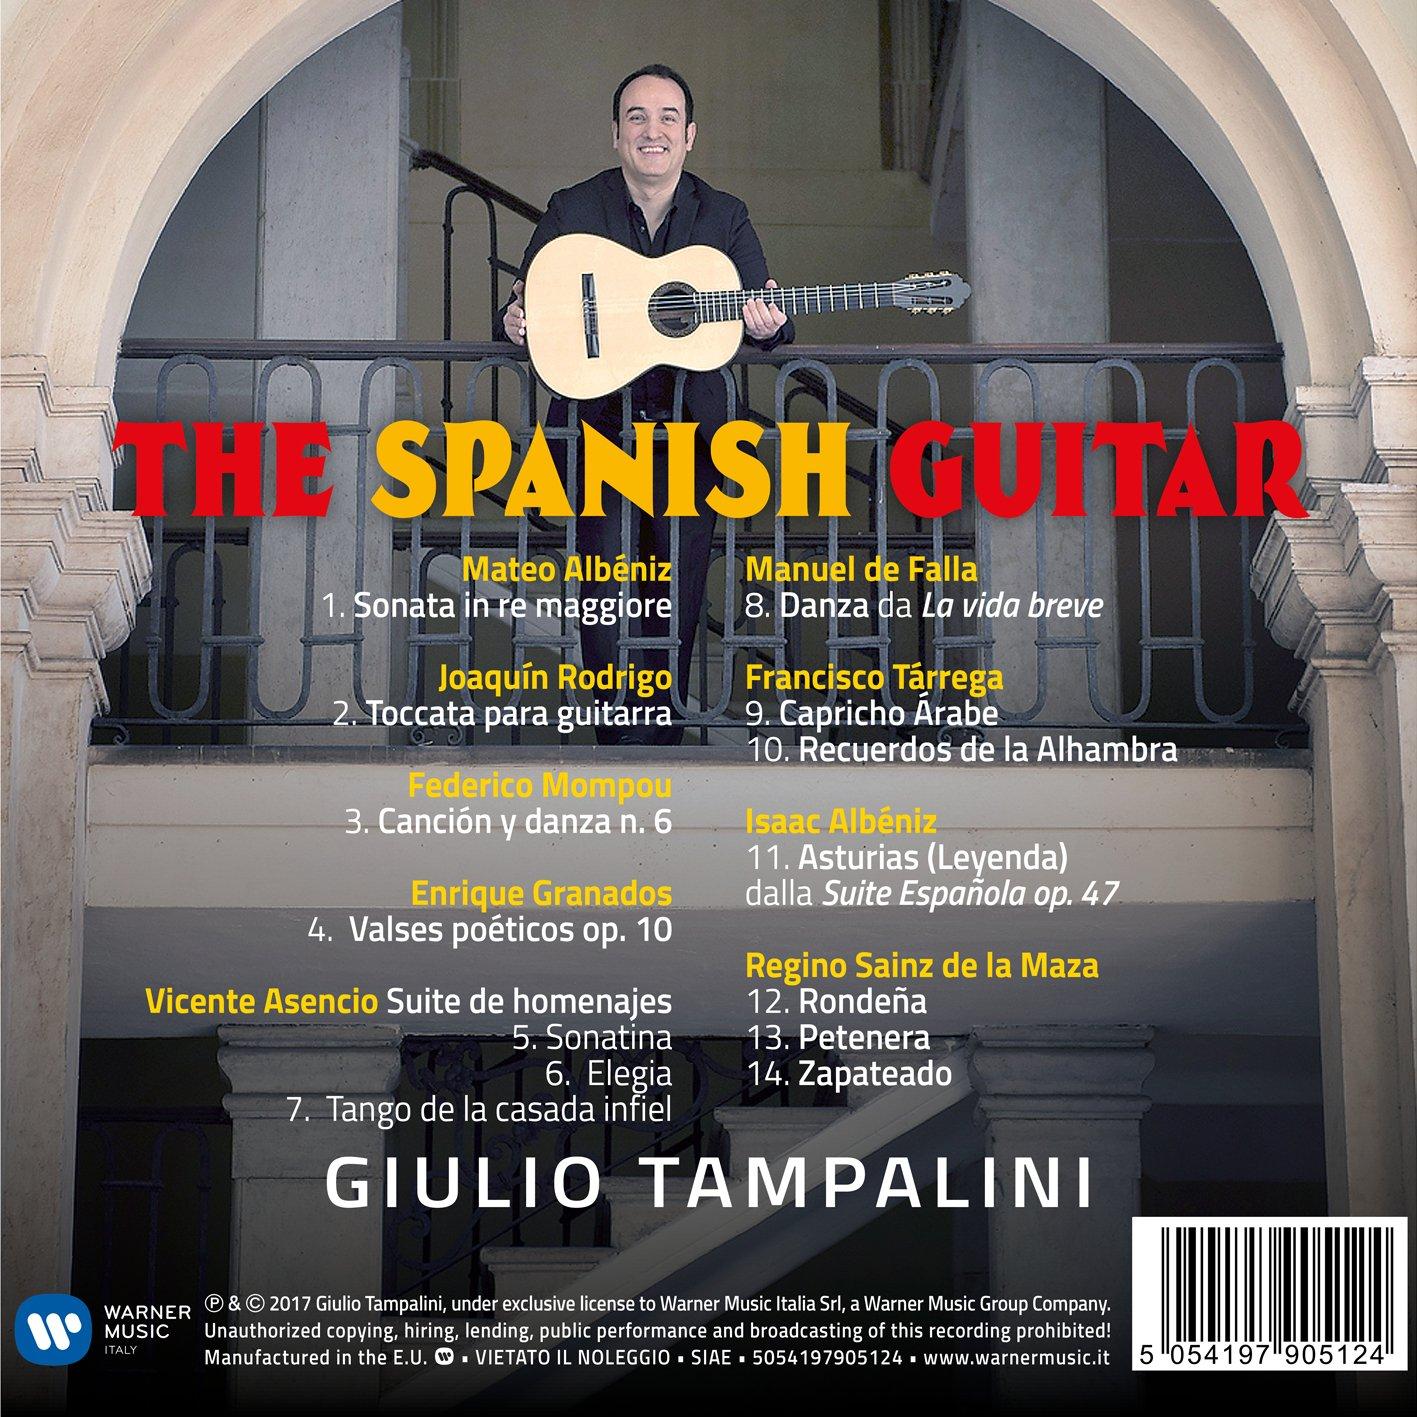 The Spanish Guitar: Giulio Tampalini: Amazon.es: Música